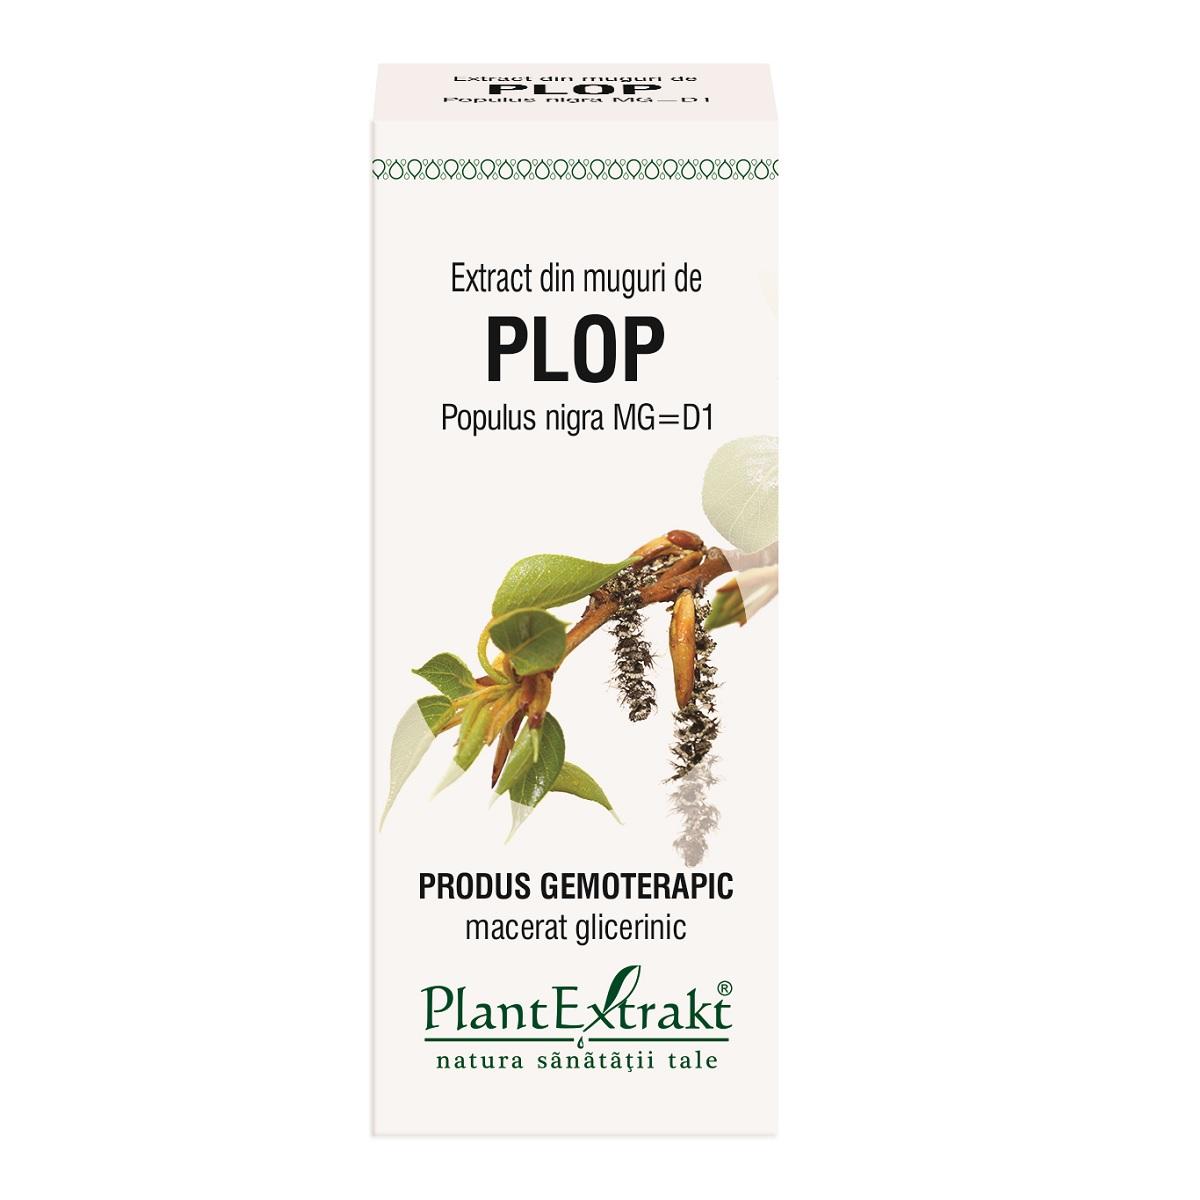 Extract din muguri de Plop, 50ml, Plantextrakt drmax.ro